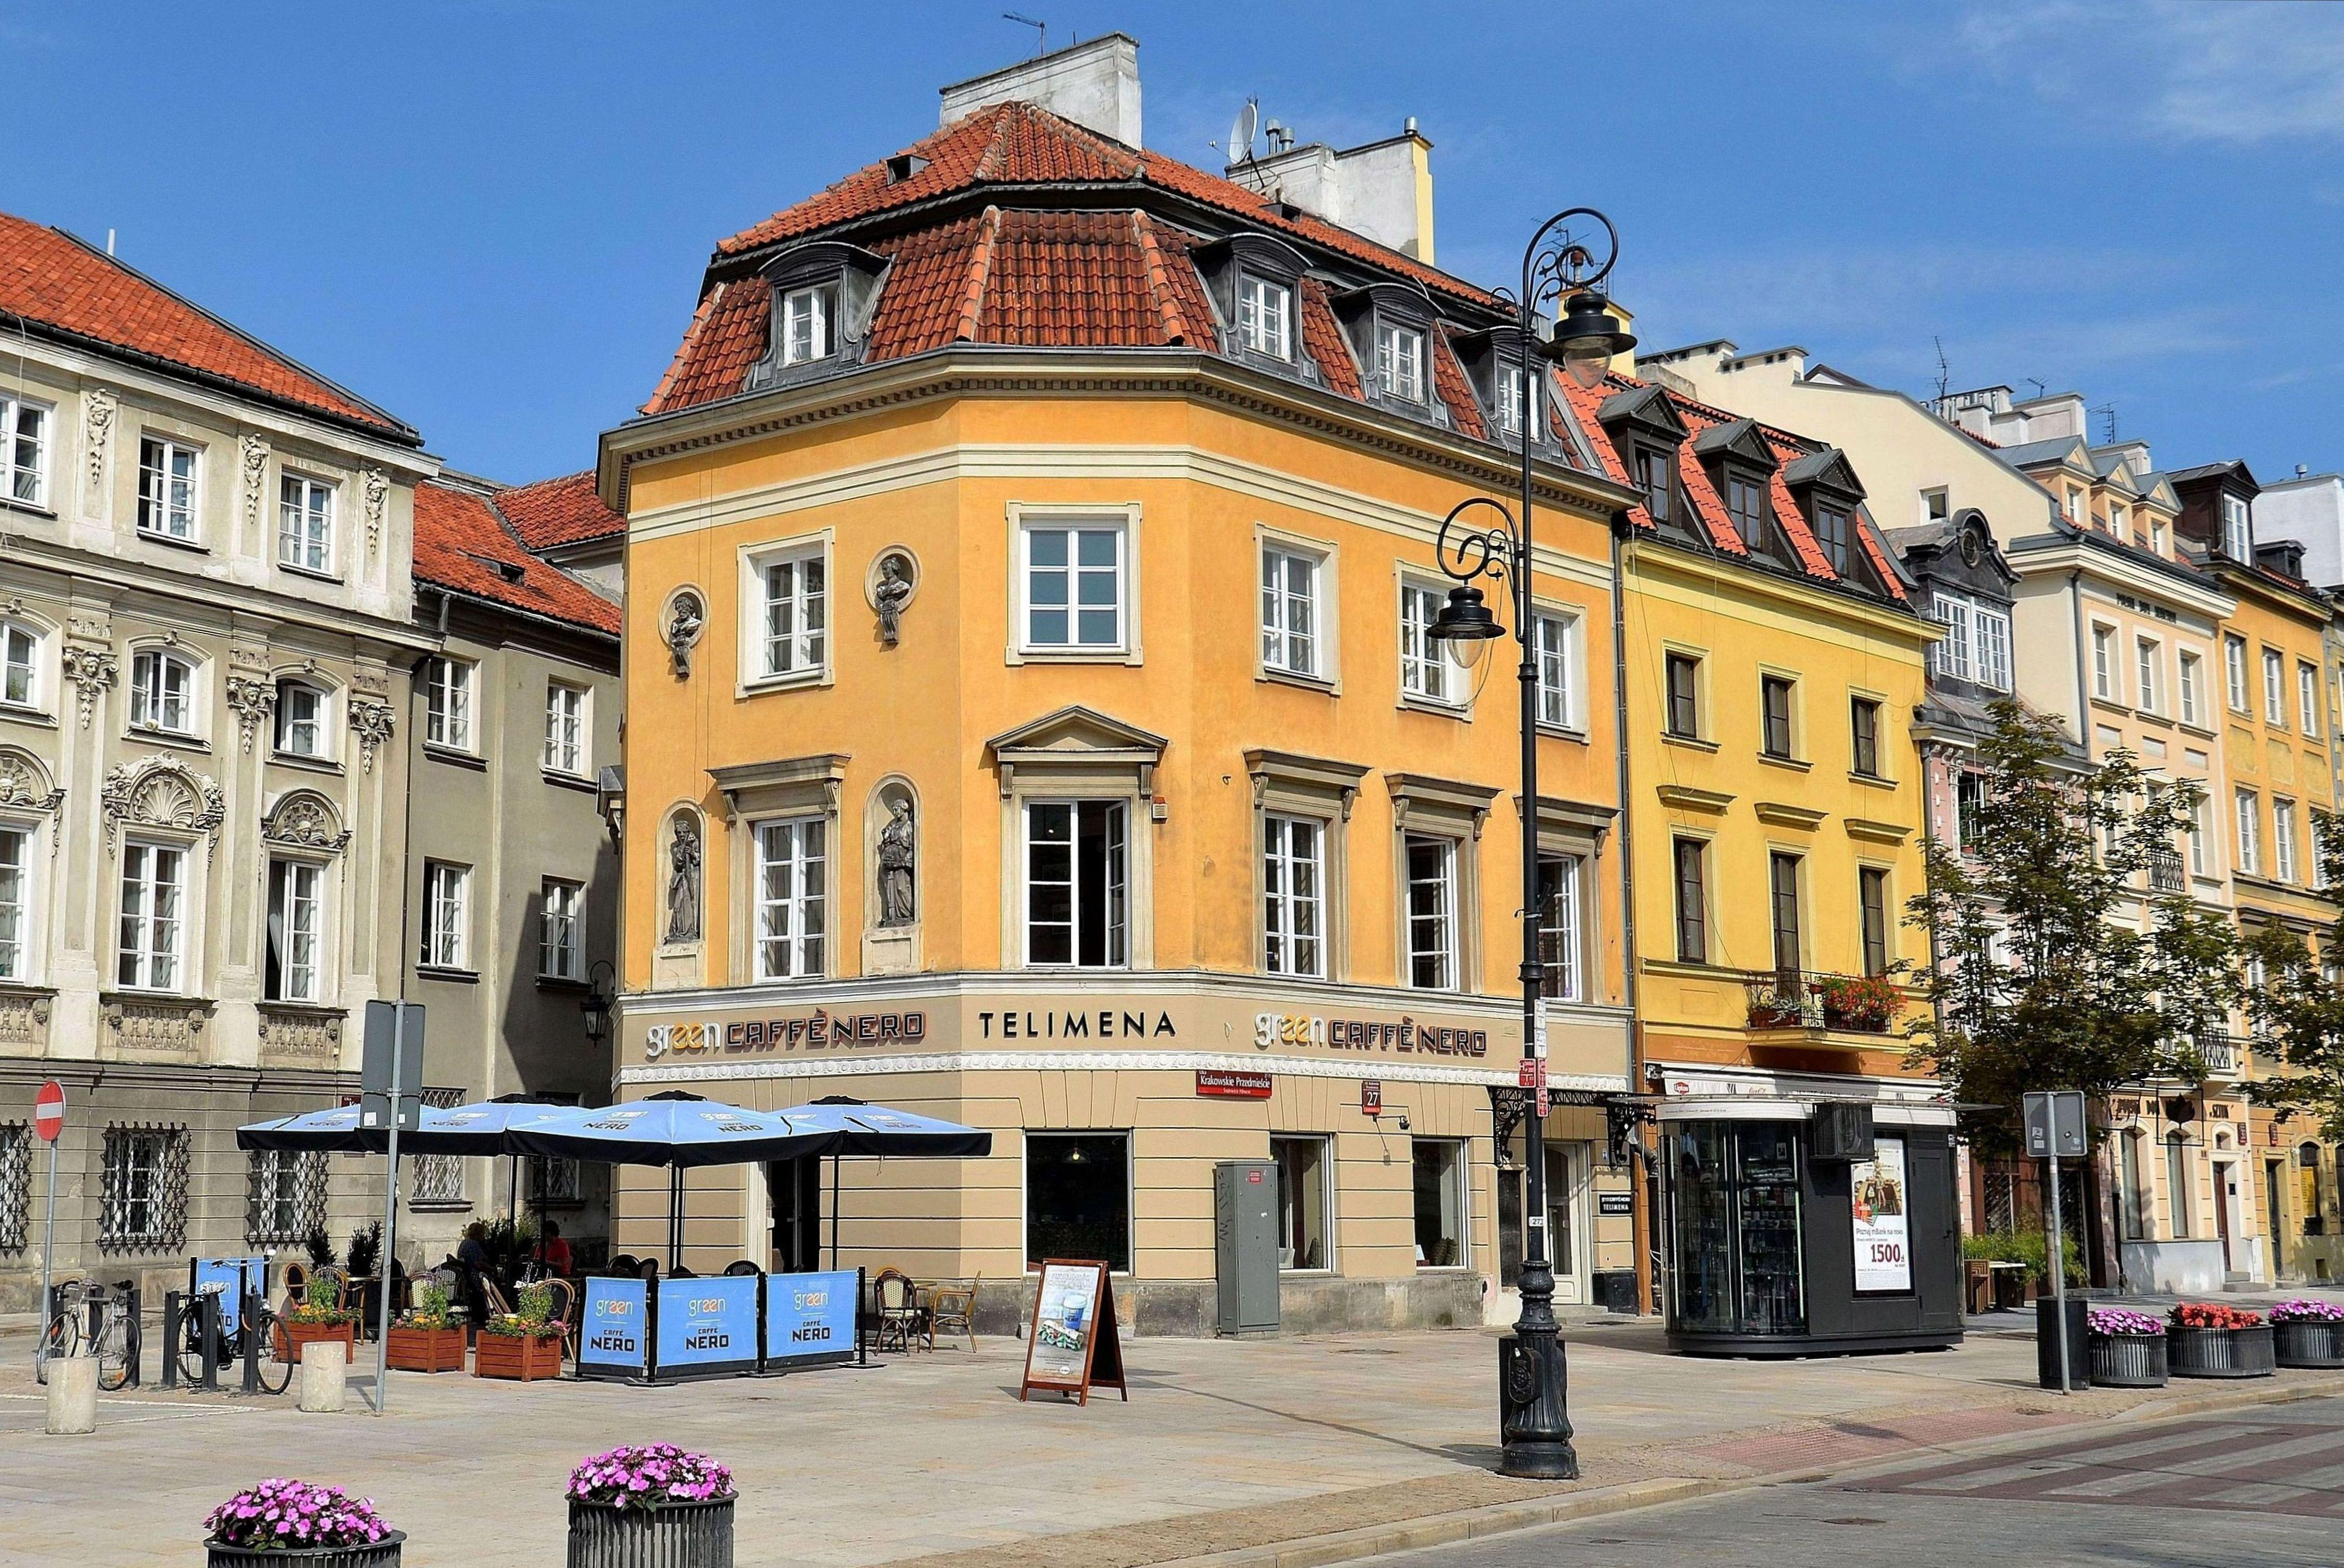 Mietshaus mit Telimena Café